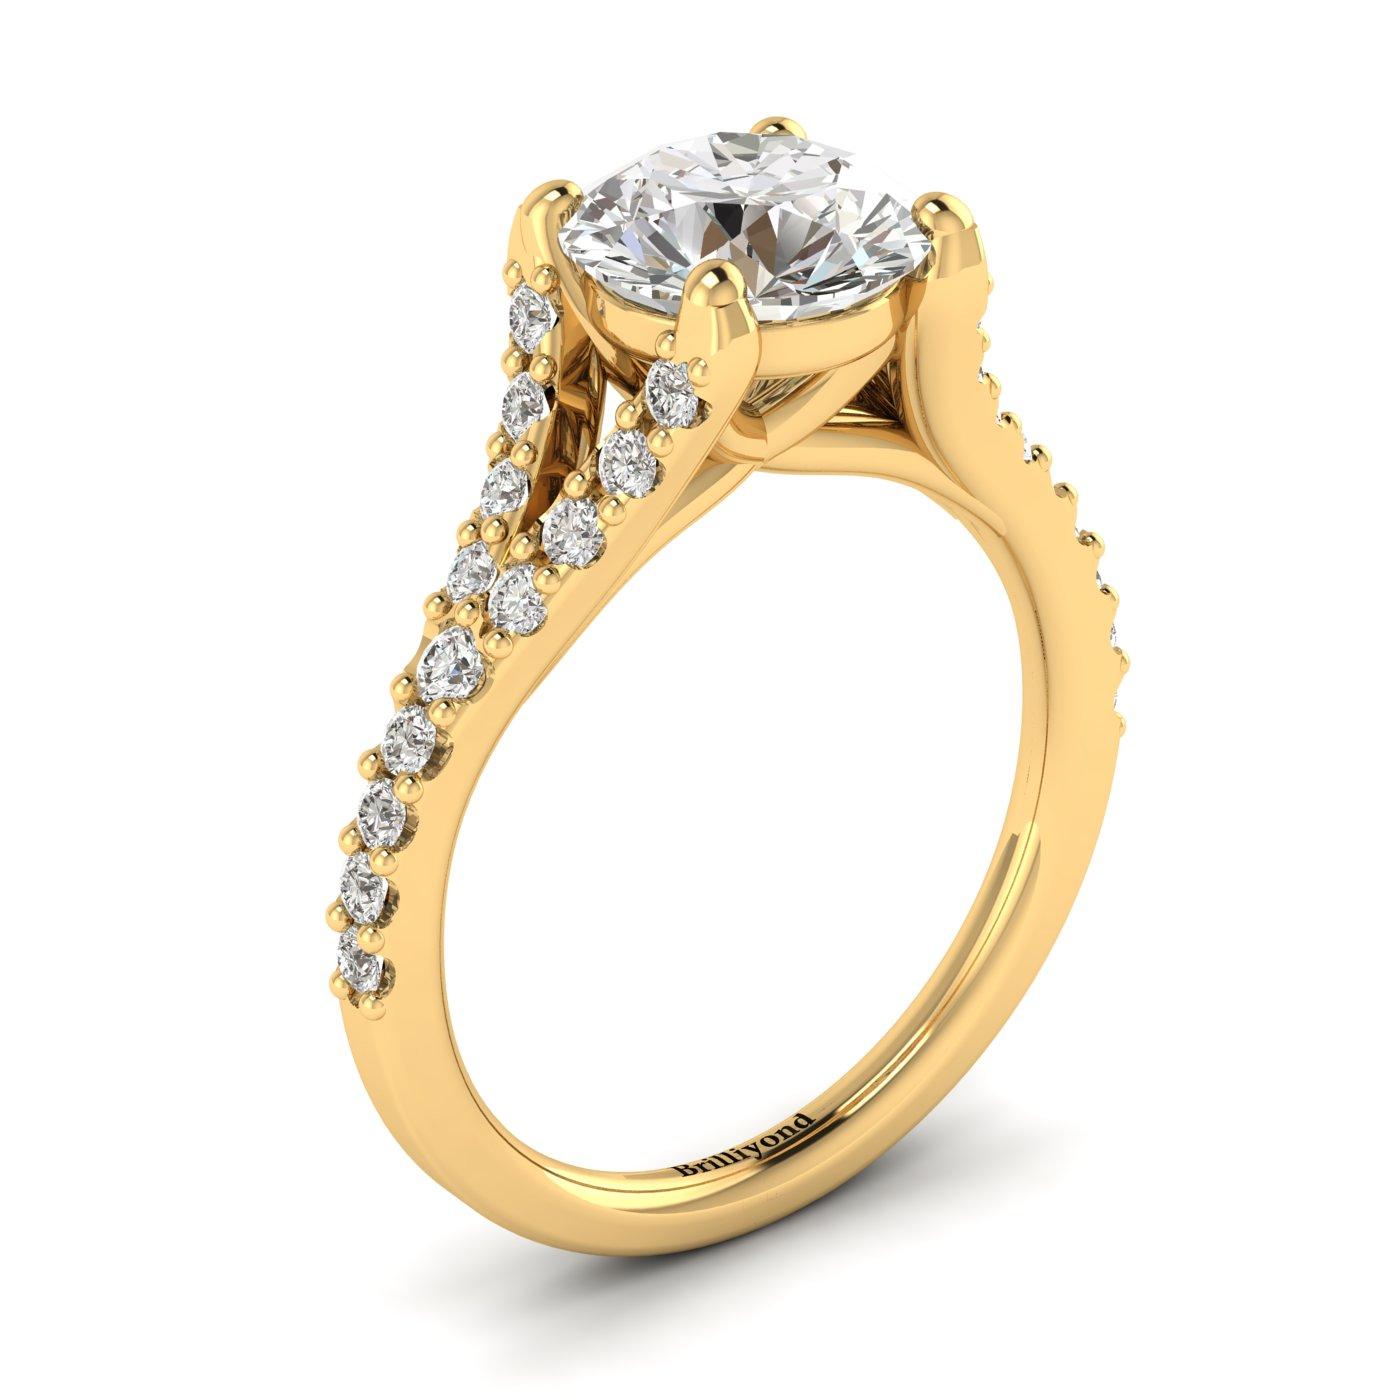 Original design Australian diamond engagement ring in 18k yellow gold band.